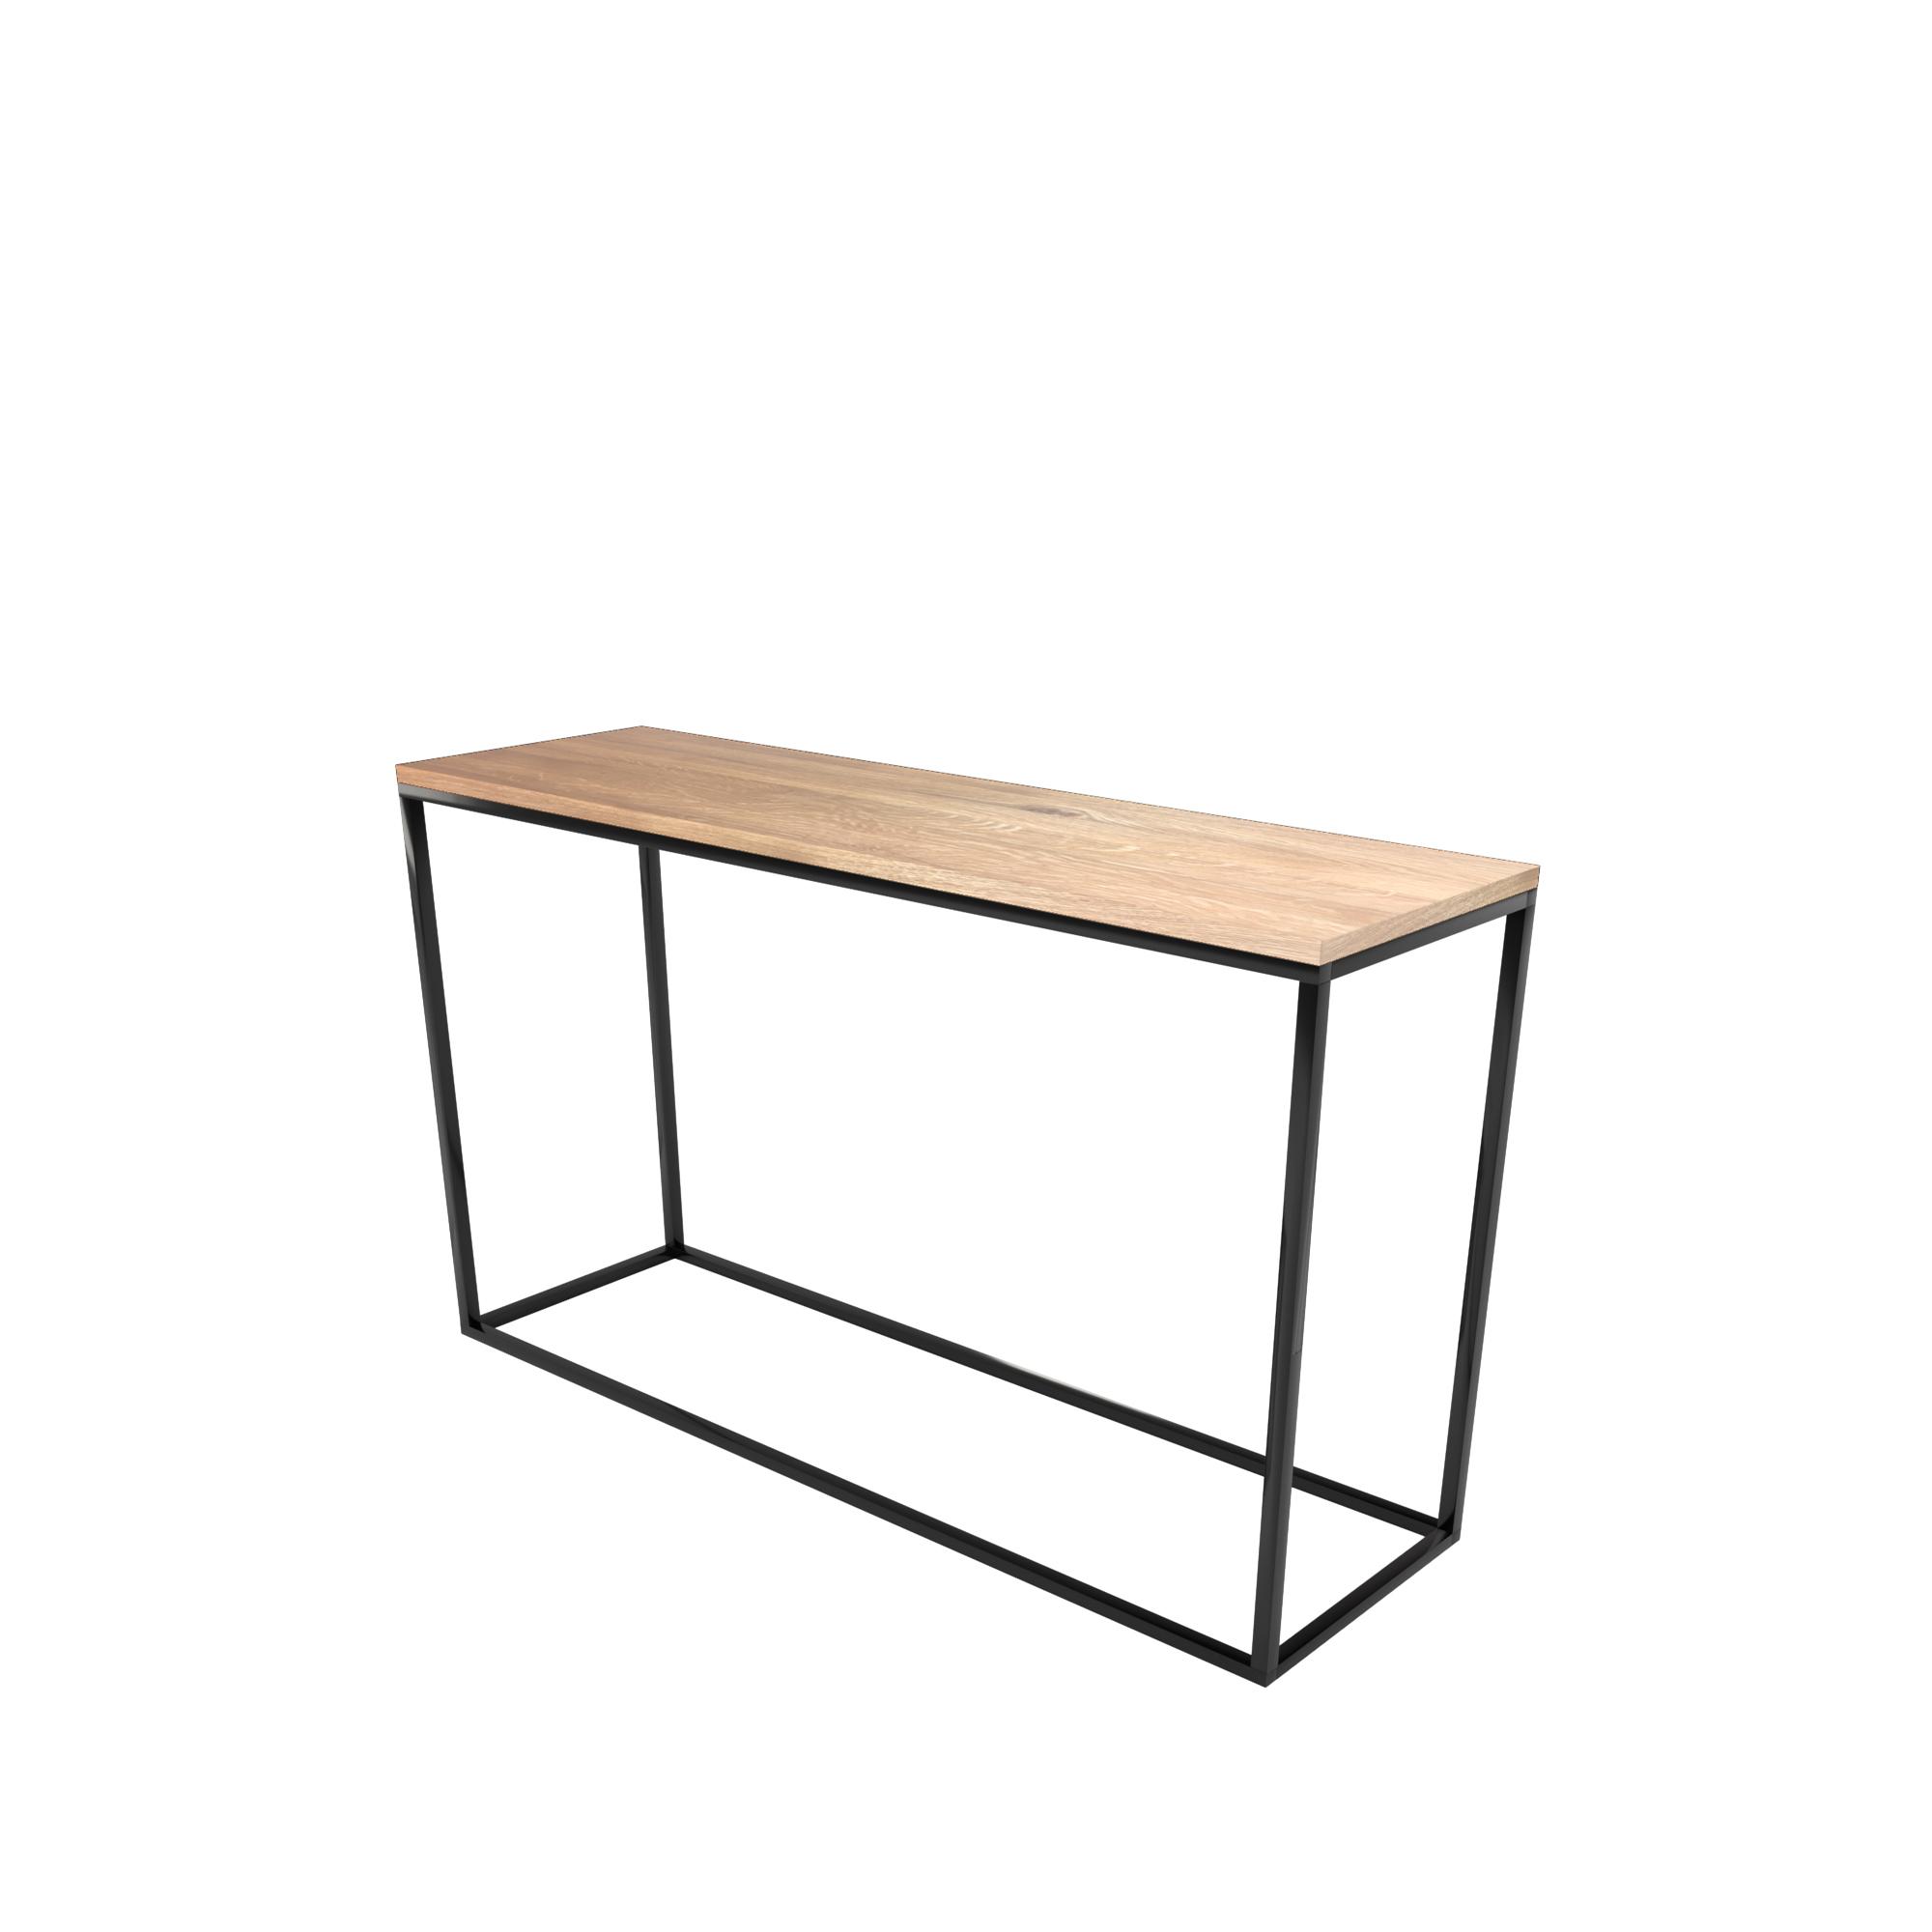 konsole linnea roomify m bel online shop. Black Bedroom Furniture Sets. Home Design Ideas